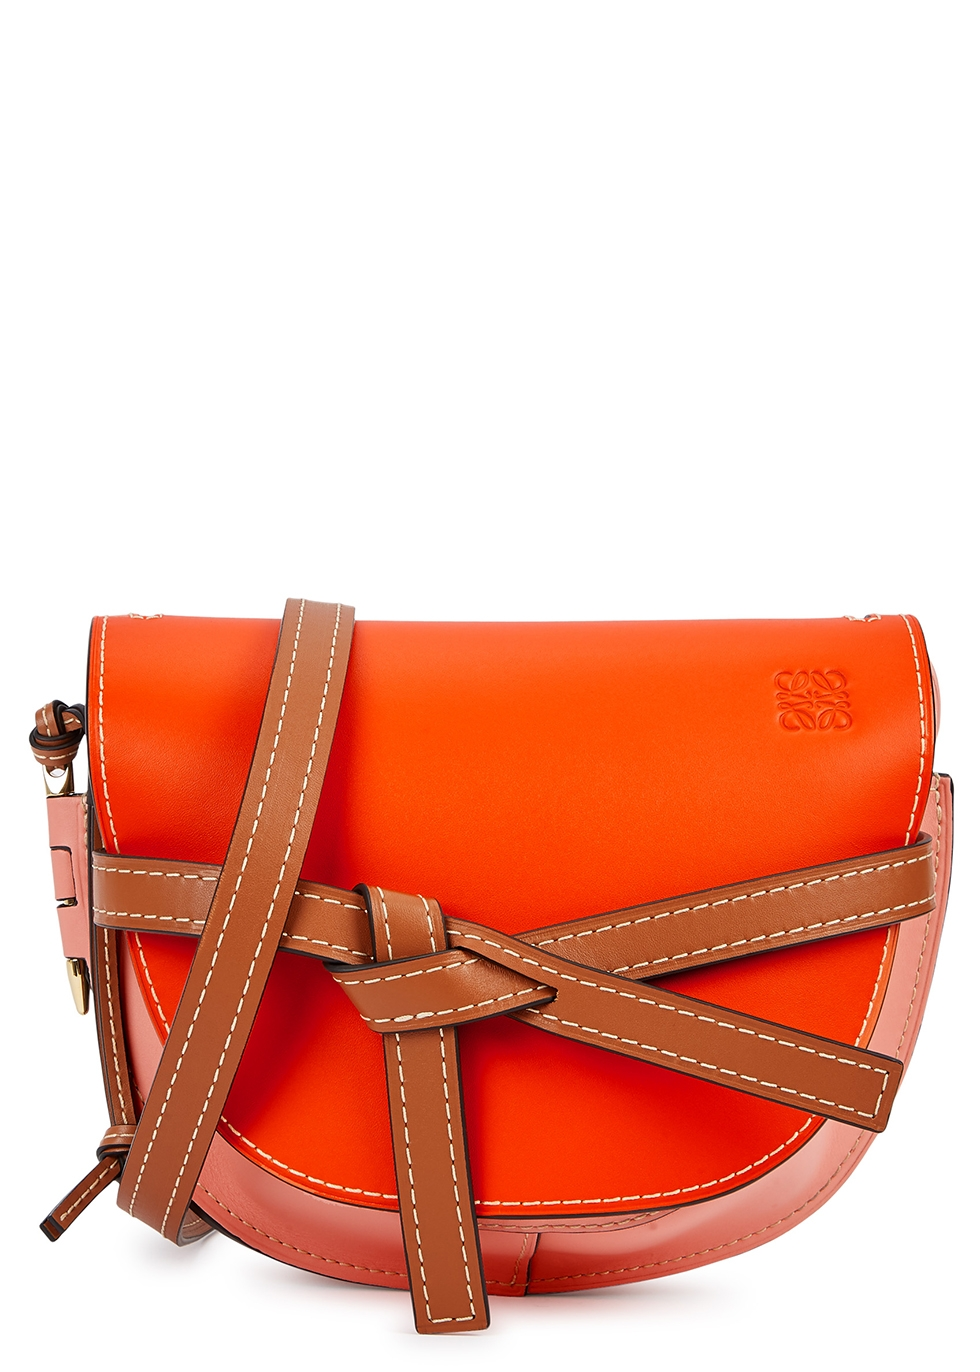 Gate small colour-block leather saddle bag - Loewe